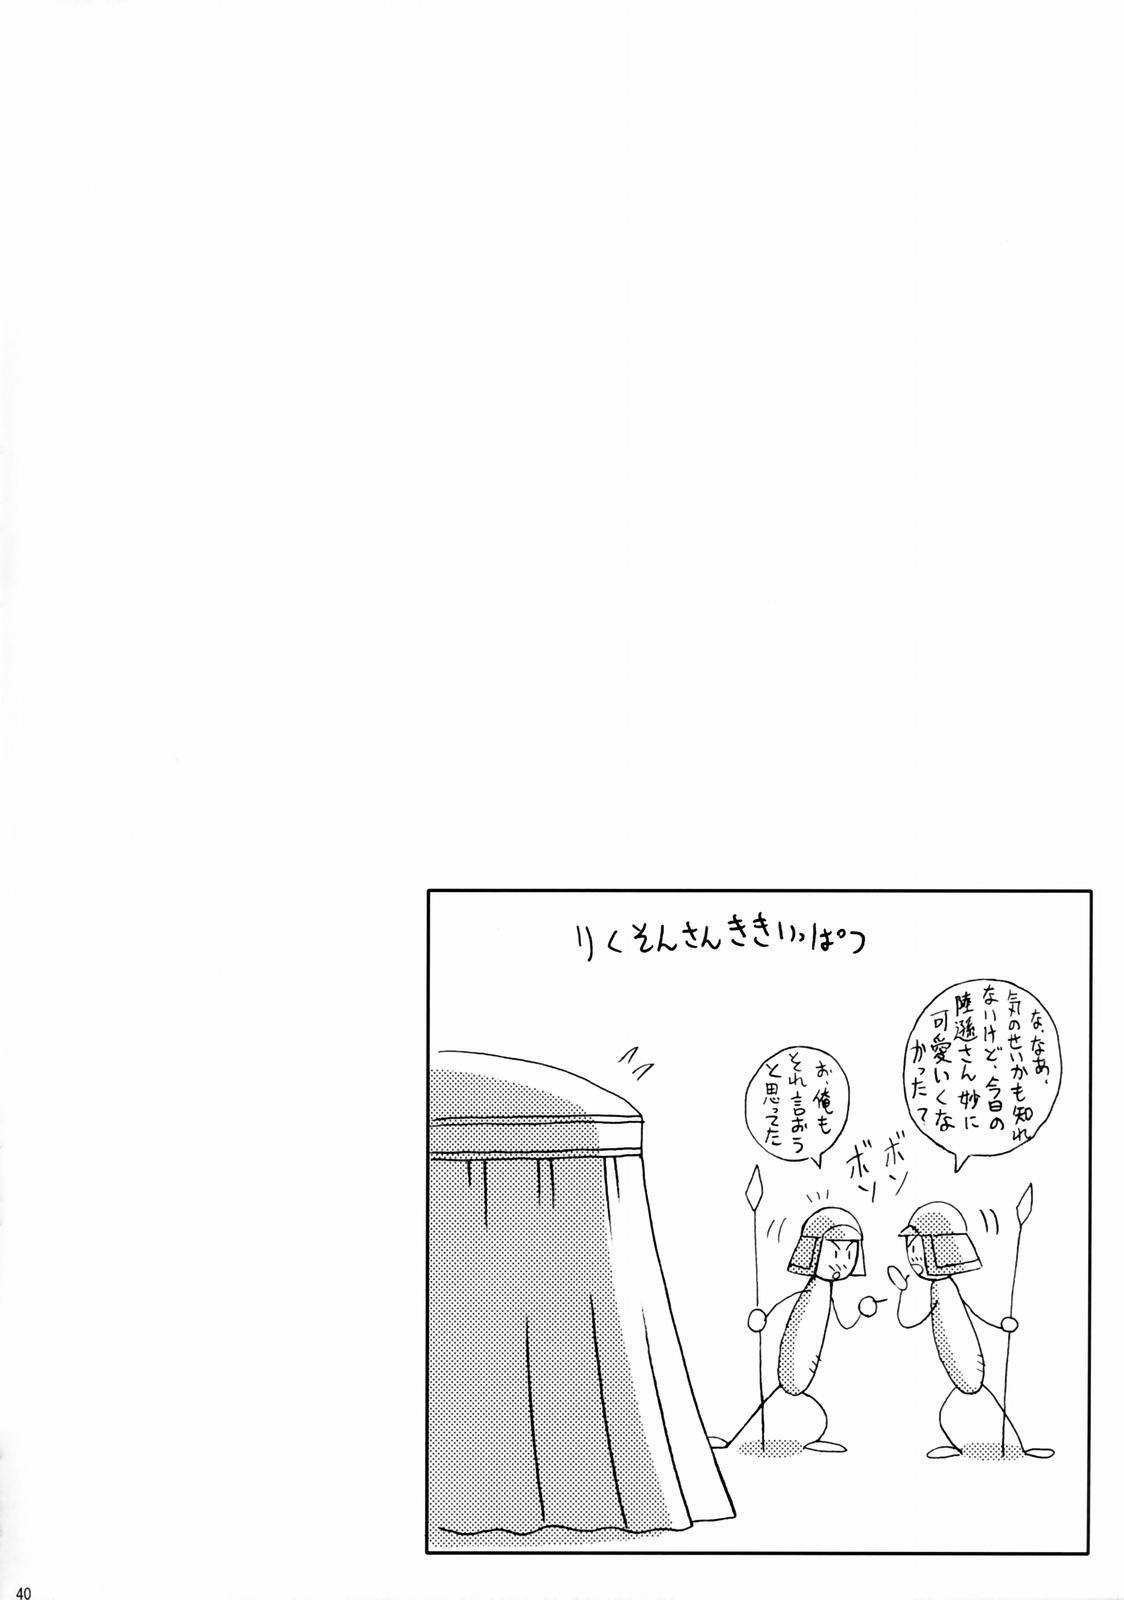 In Sangoku Musou Rikuson Gaiden 38